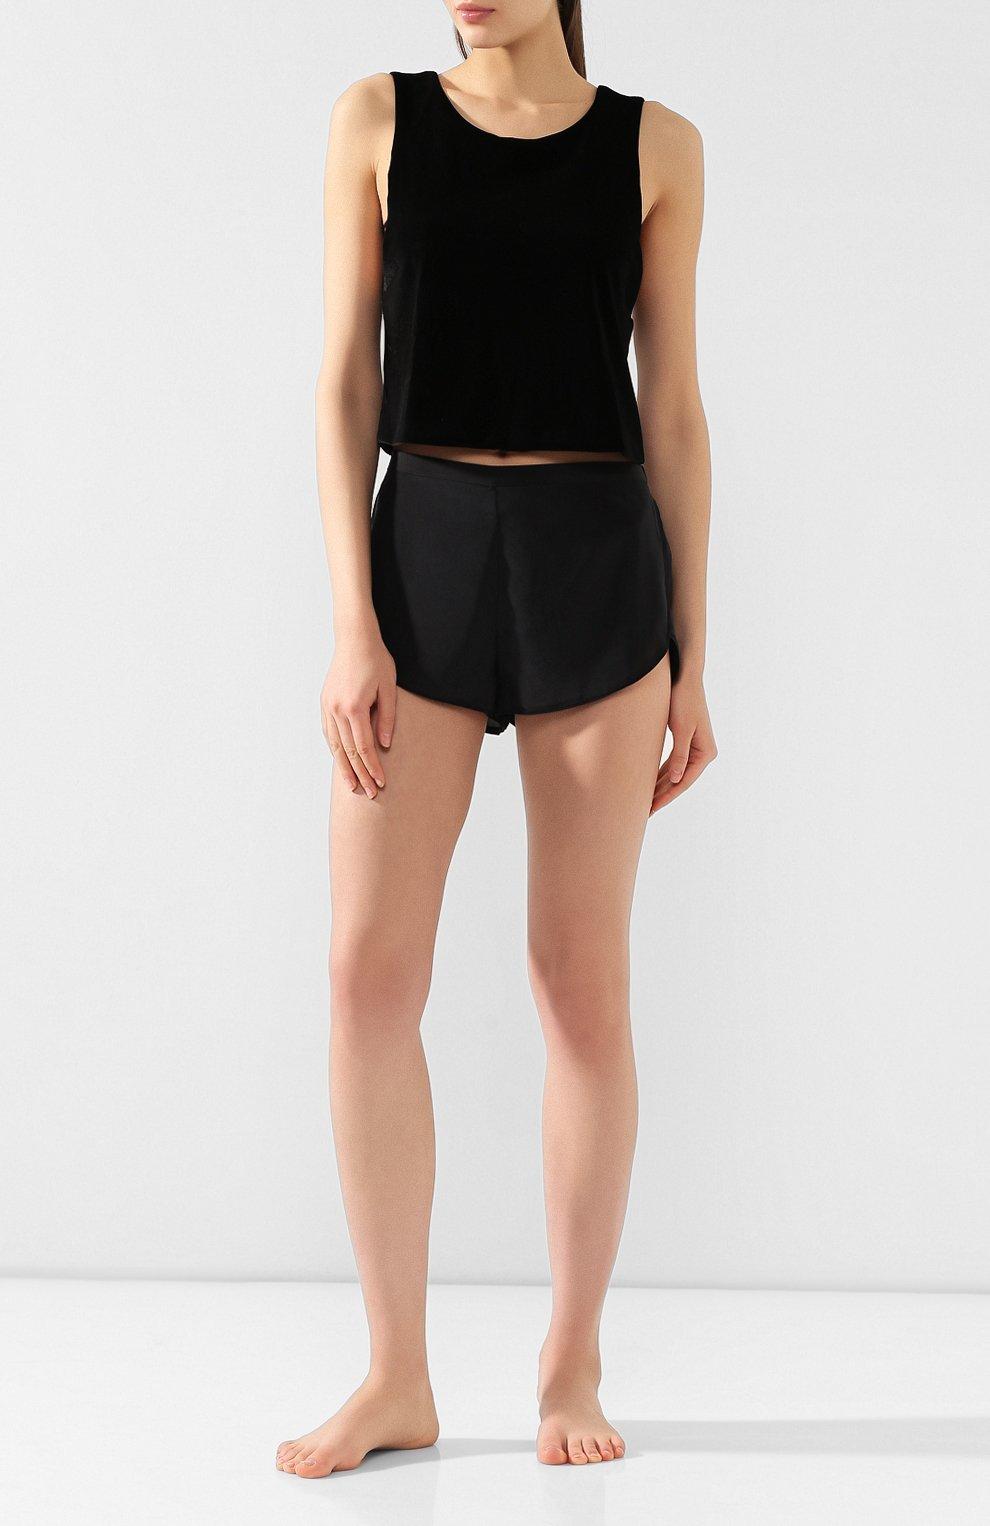 Женские шорты CHANTAL THOMASS черного цвета, арт. TA17_чер | Фото 2